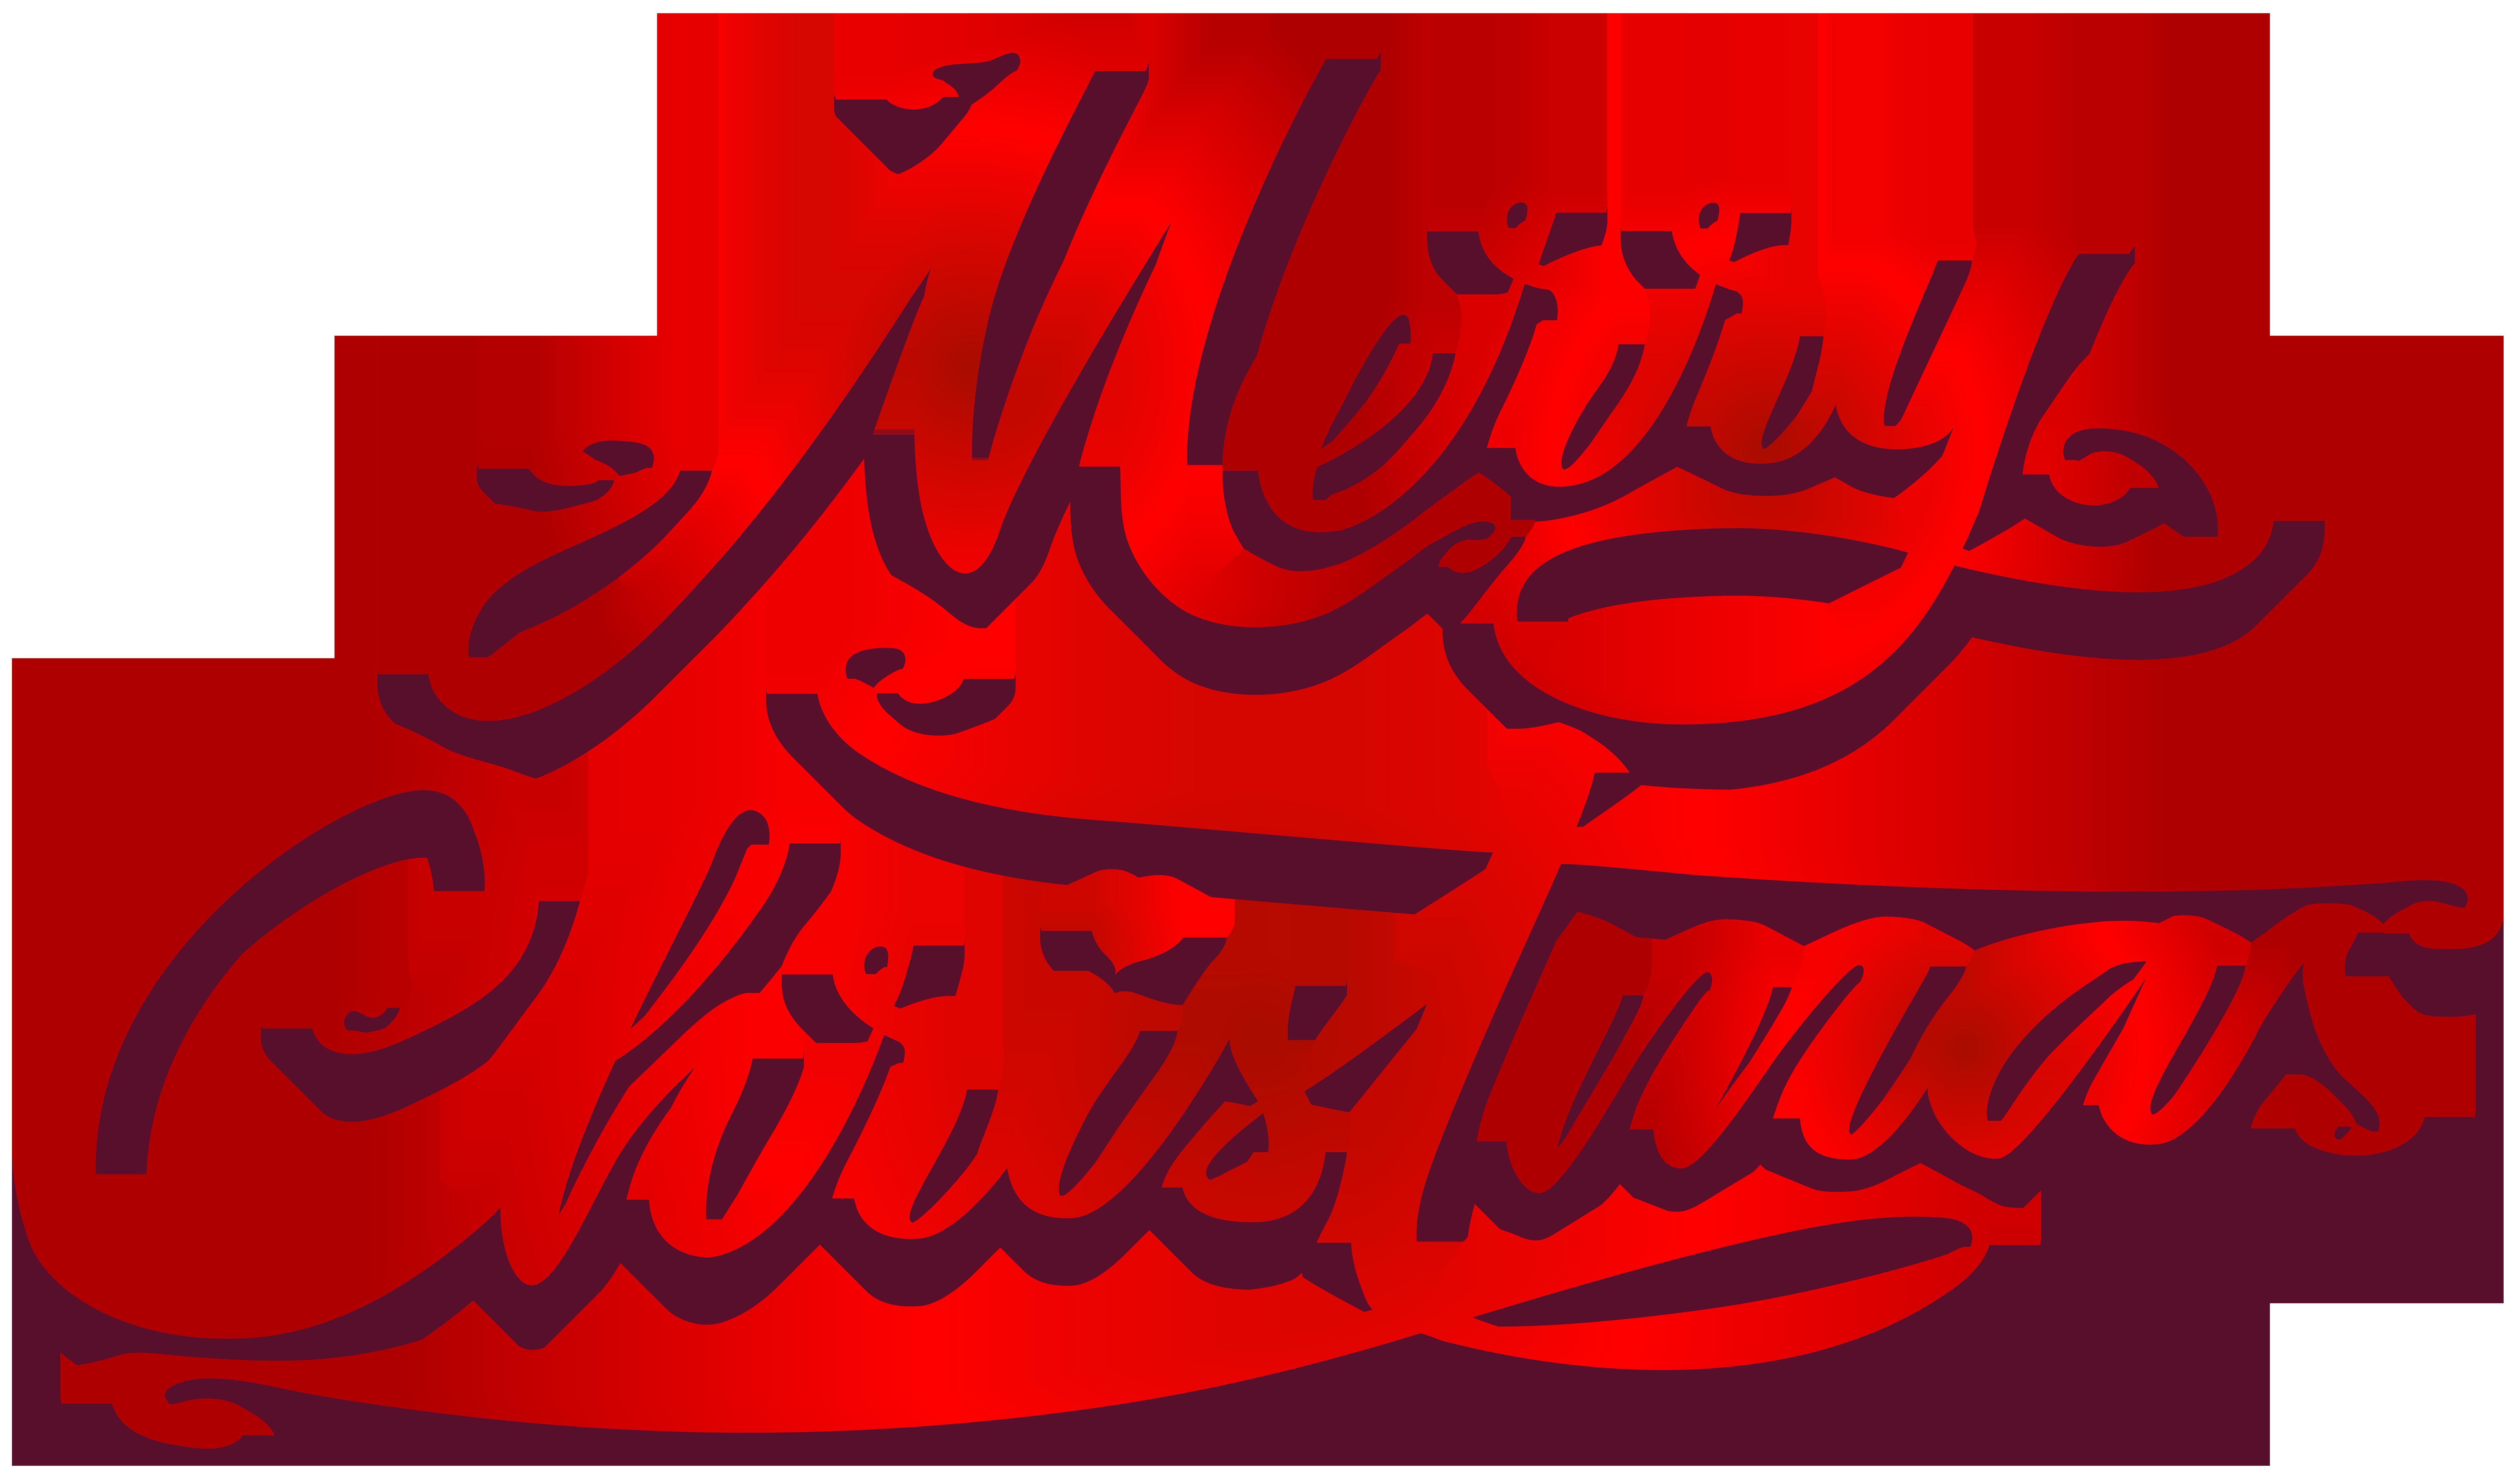 High Resolution Merry Christmas Clipart Hd.